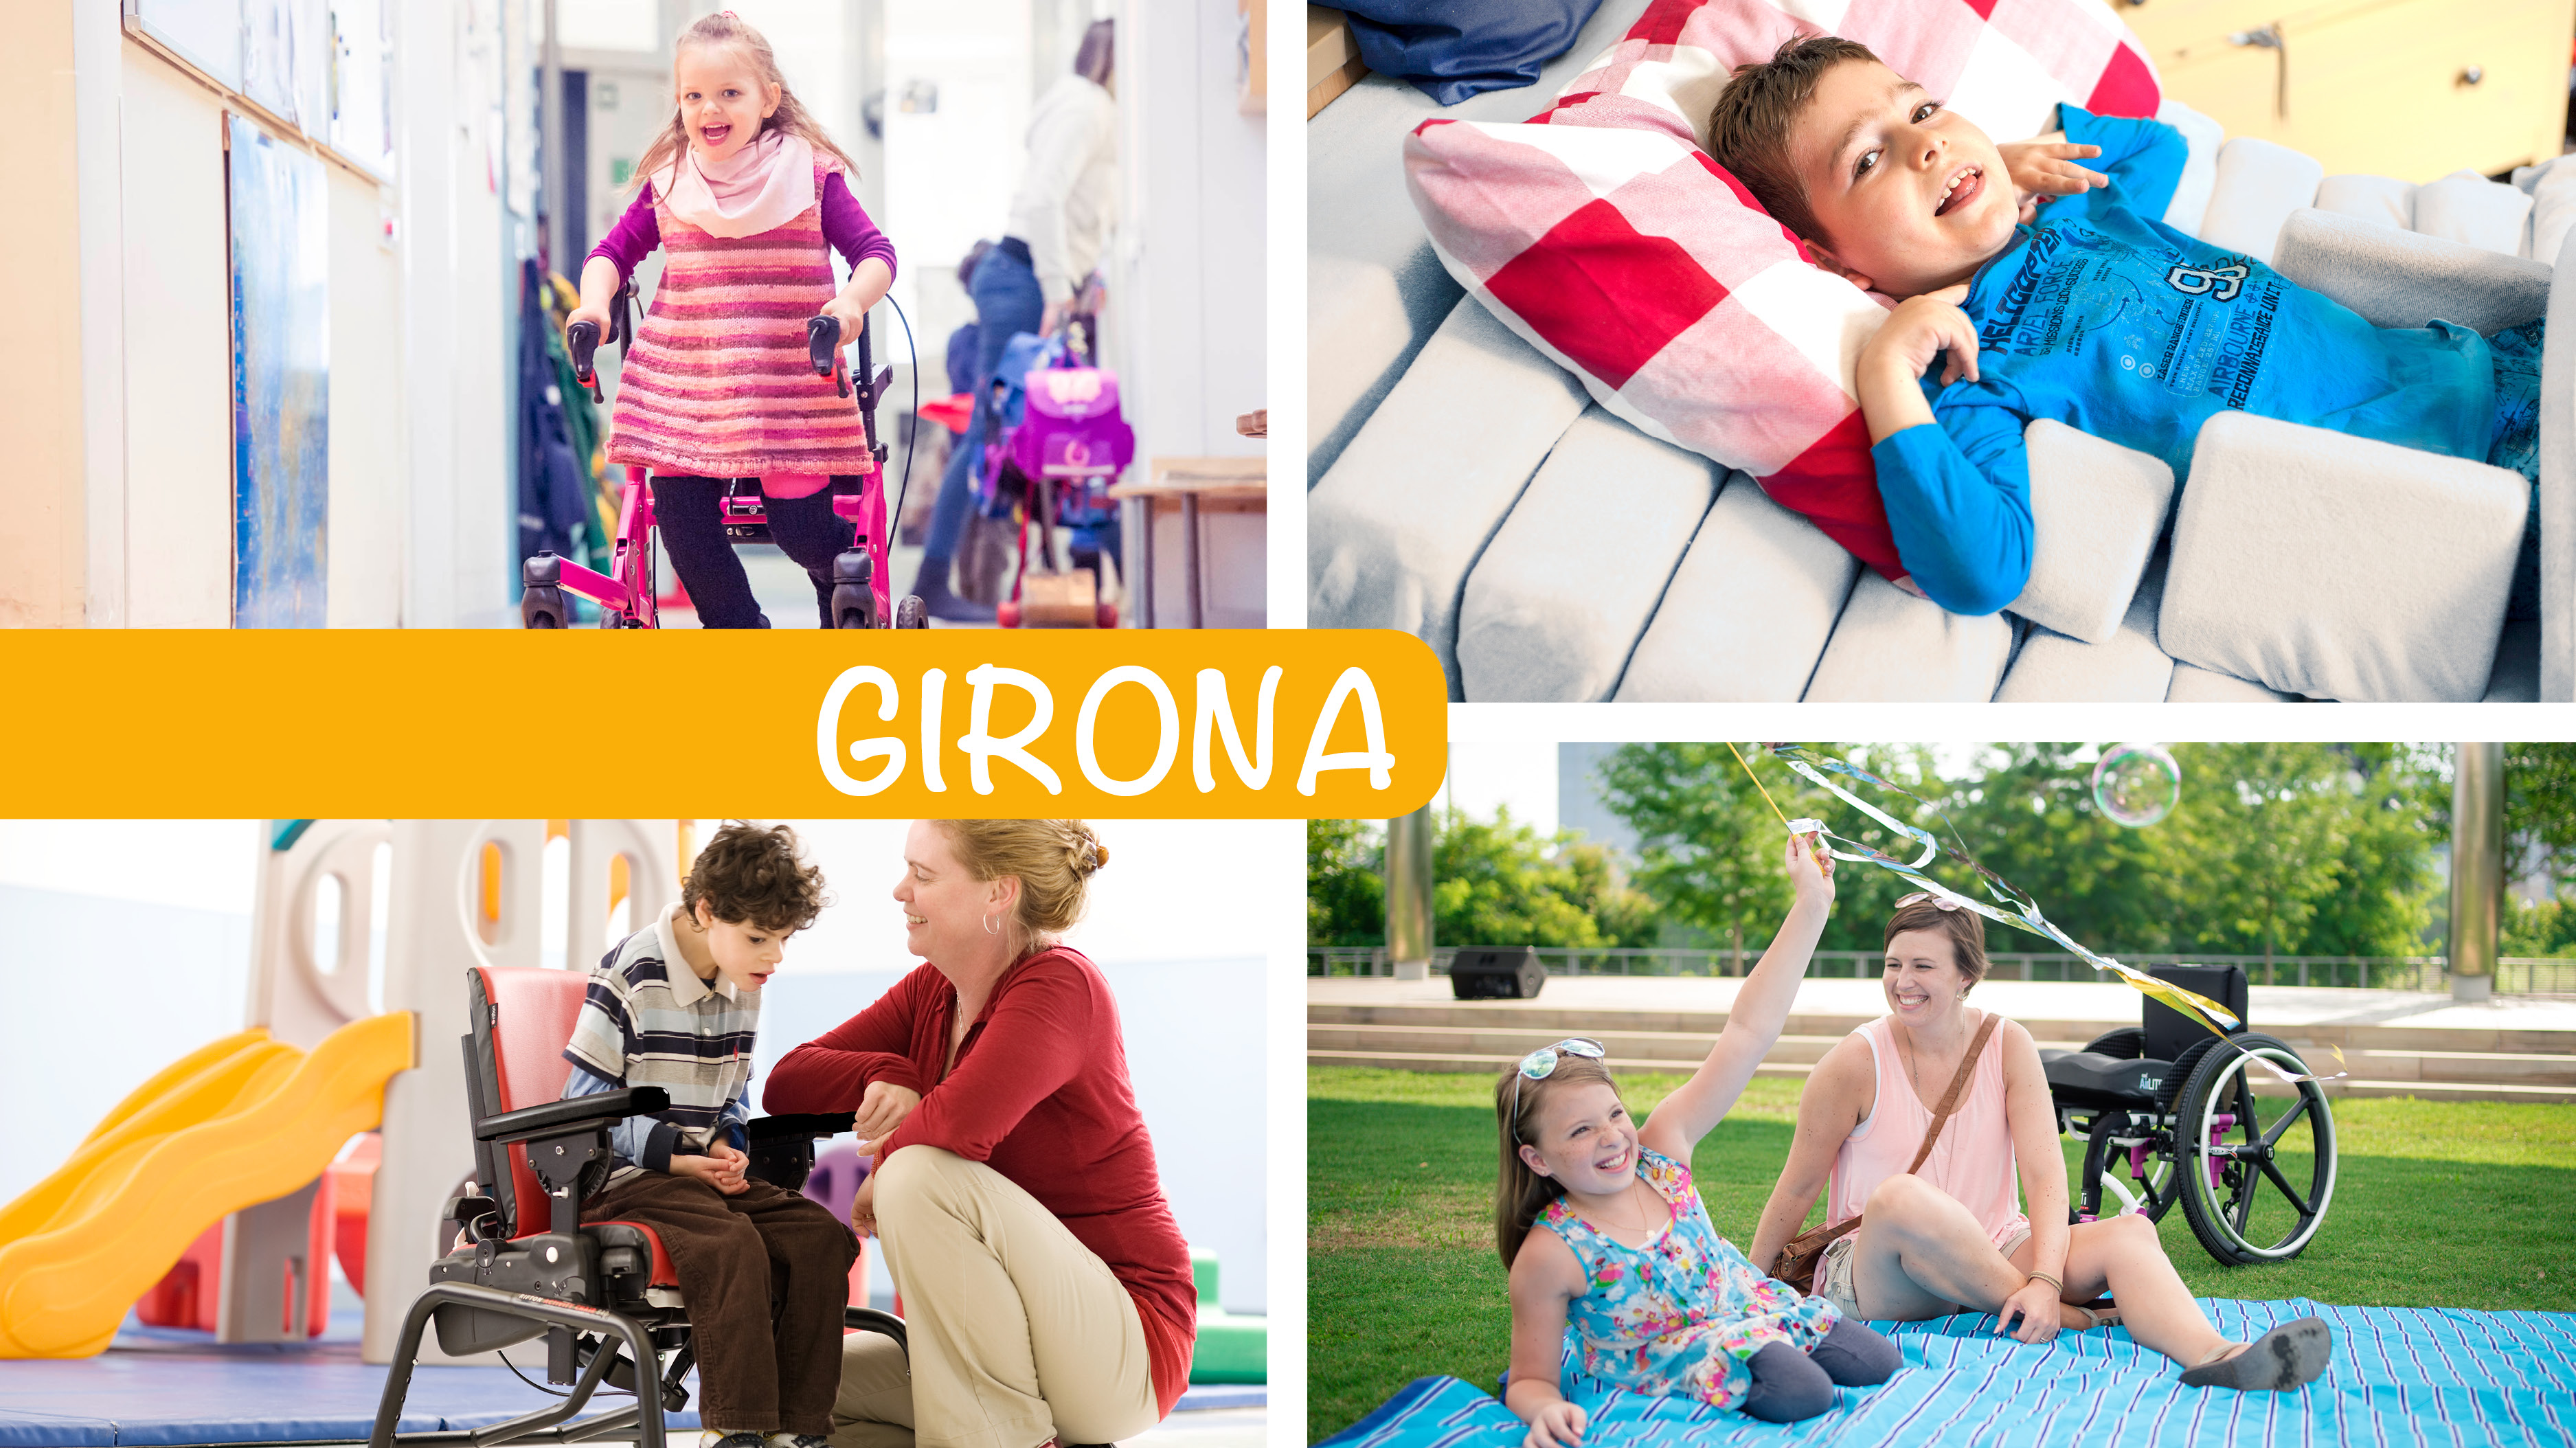 Girona acogerá el Rehacademia Family 24 horas, destinado a las familias